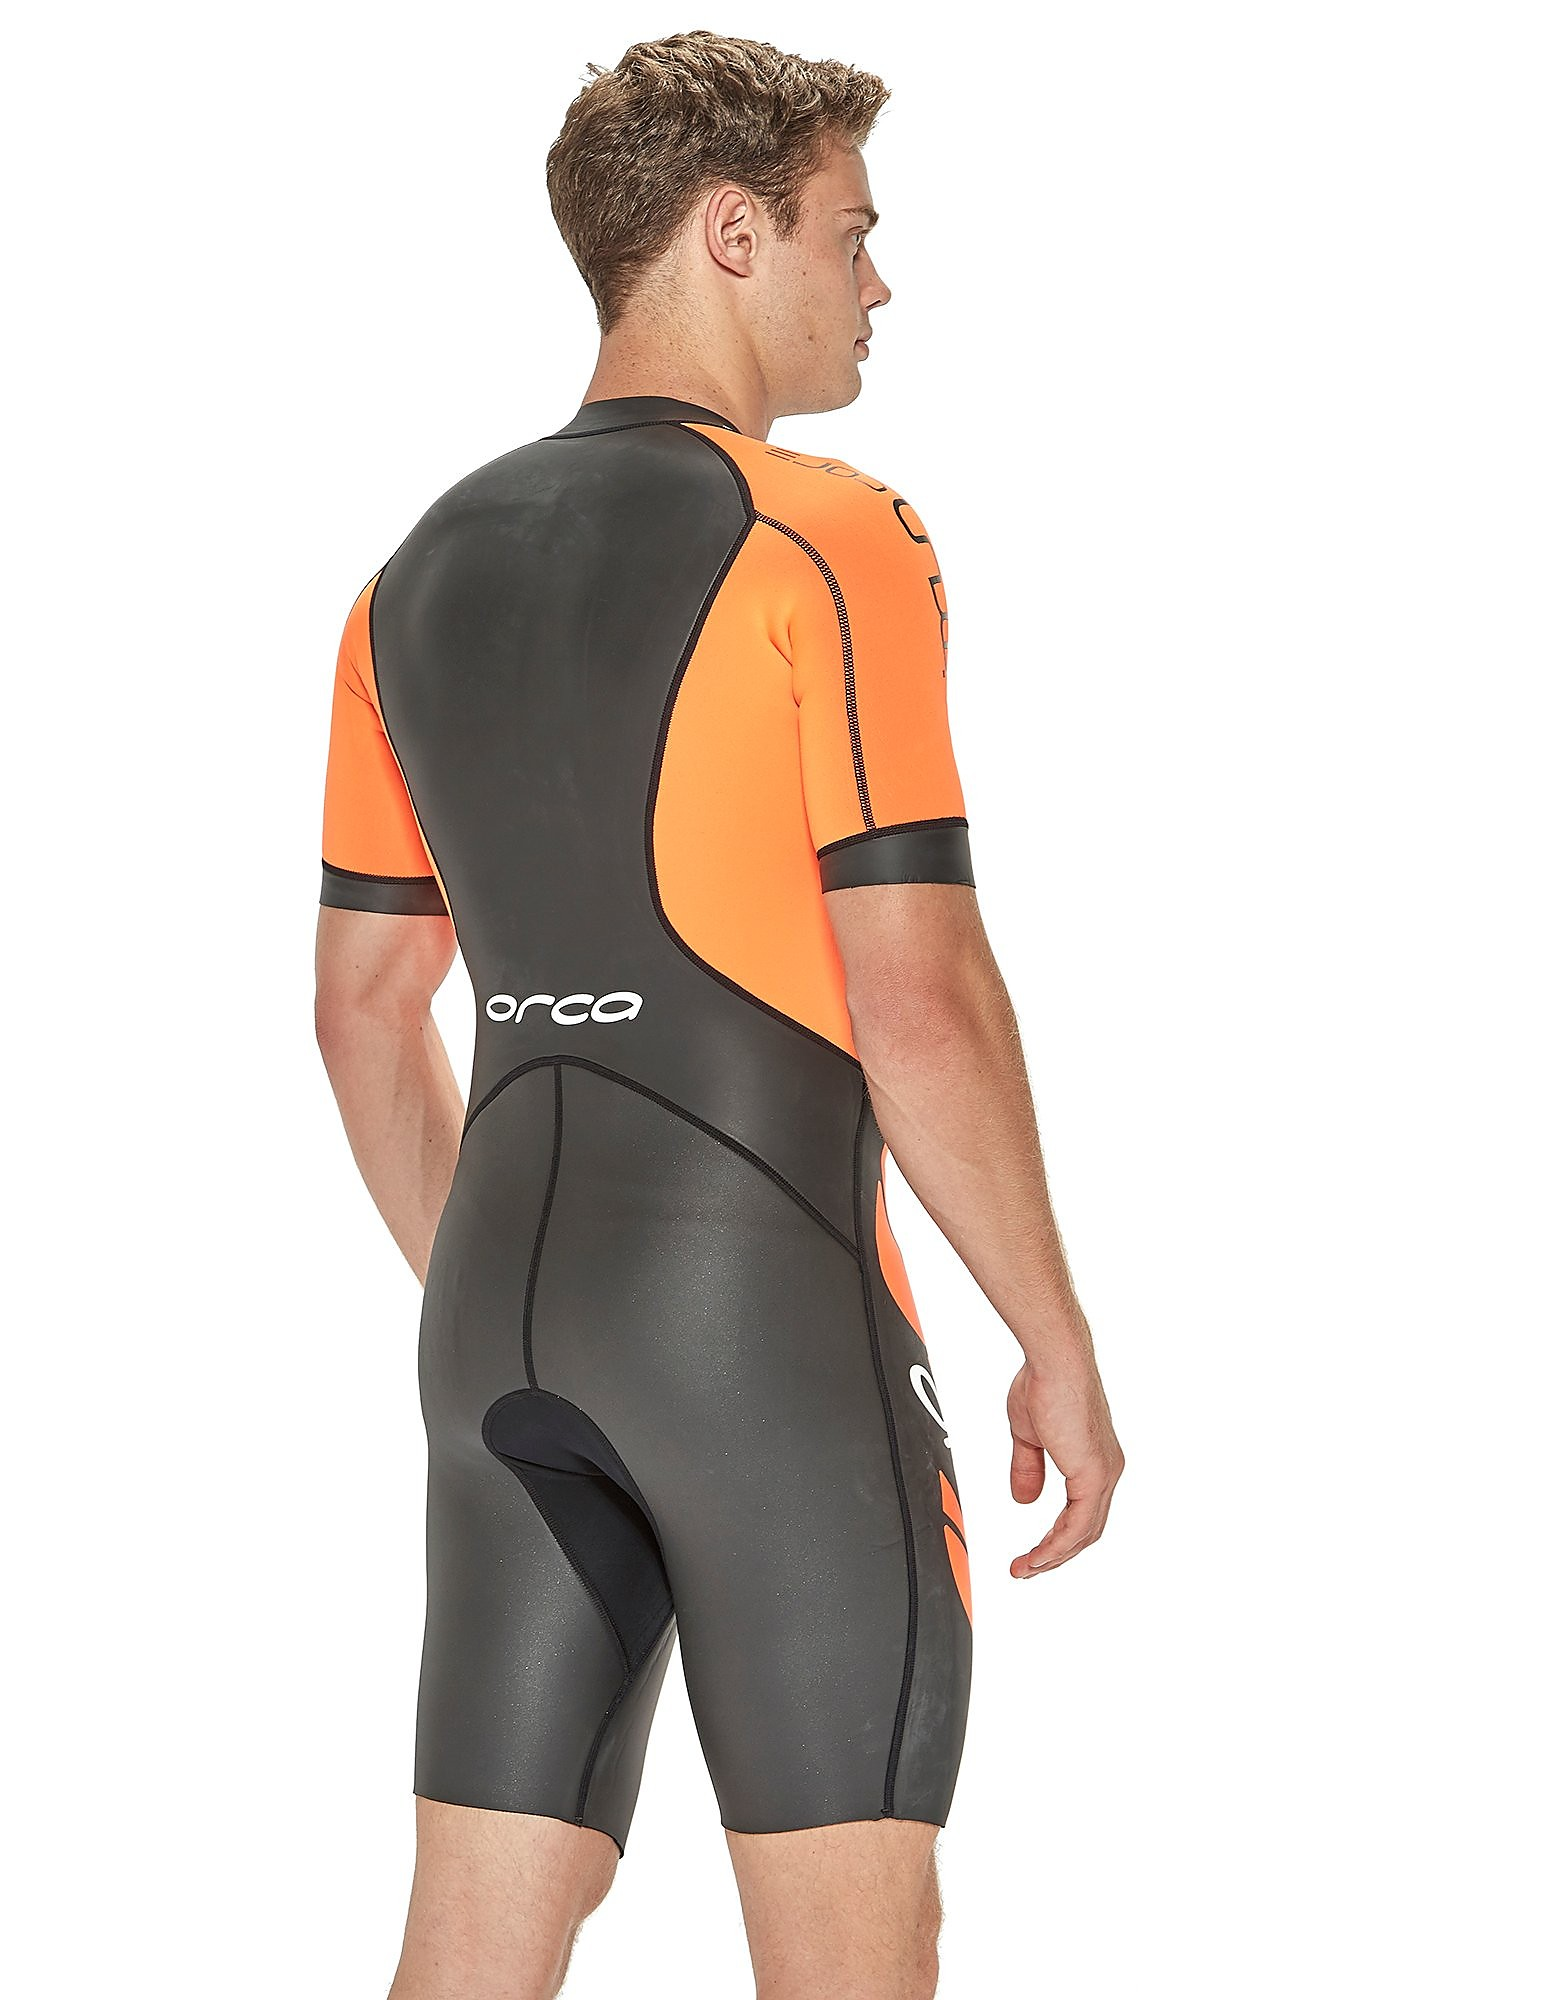 Orca Core SwimRun Men's Wetsuit